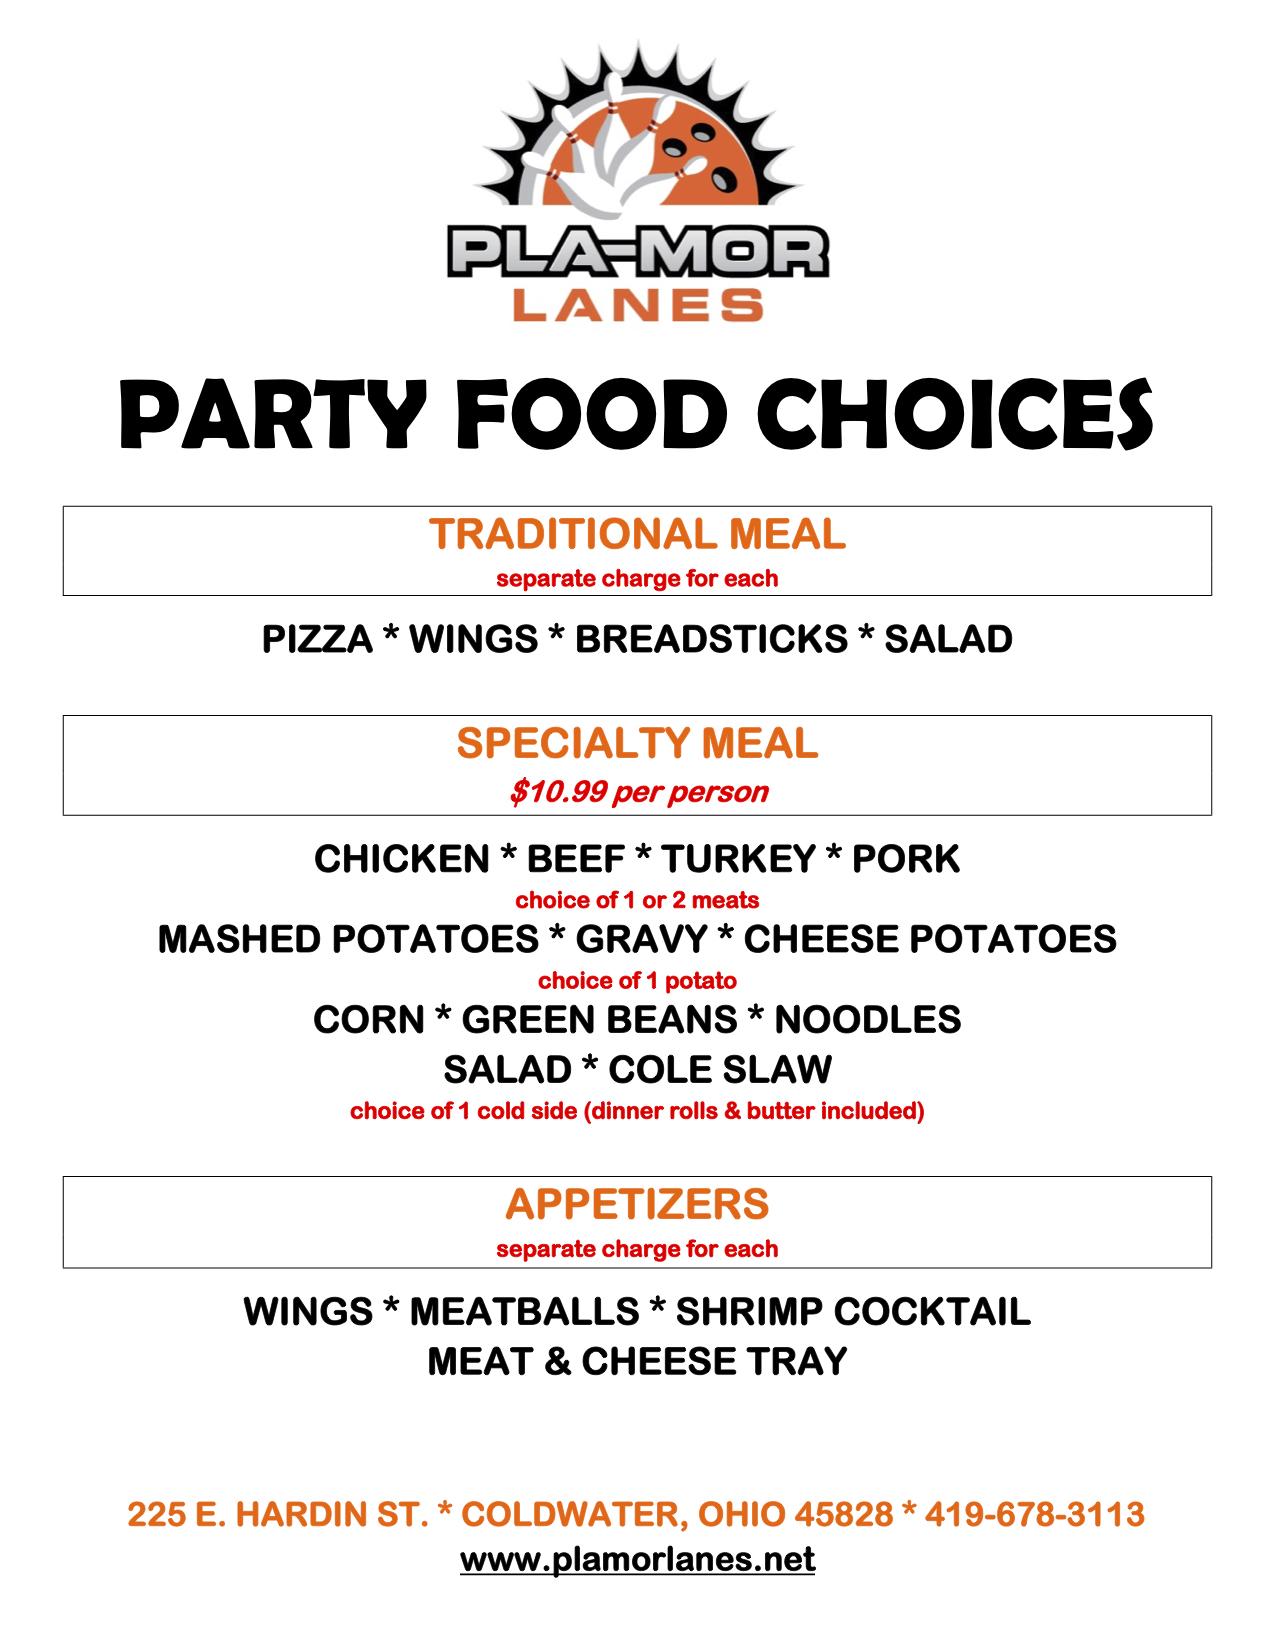 Food Menu for Corporate Parties